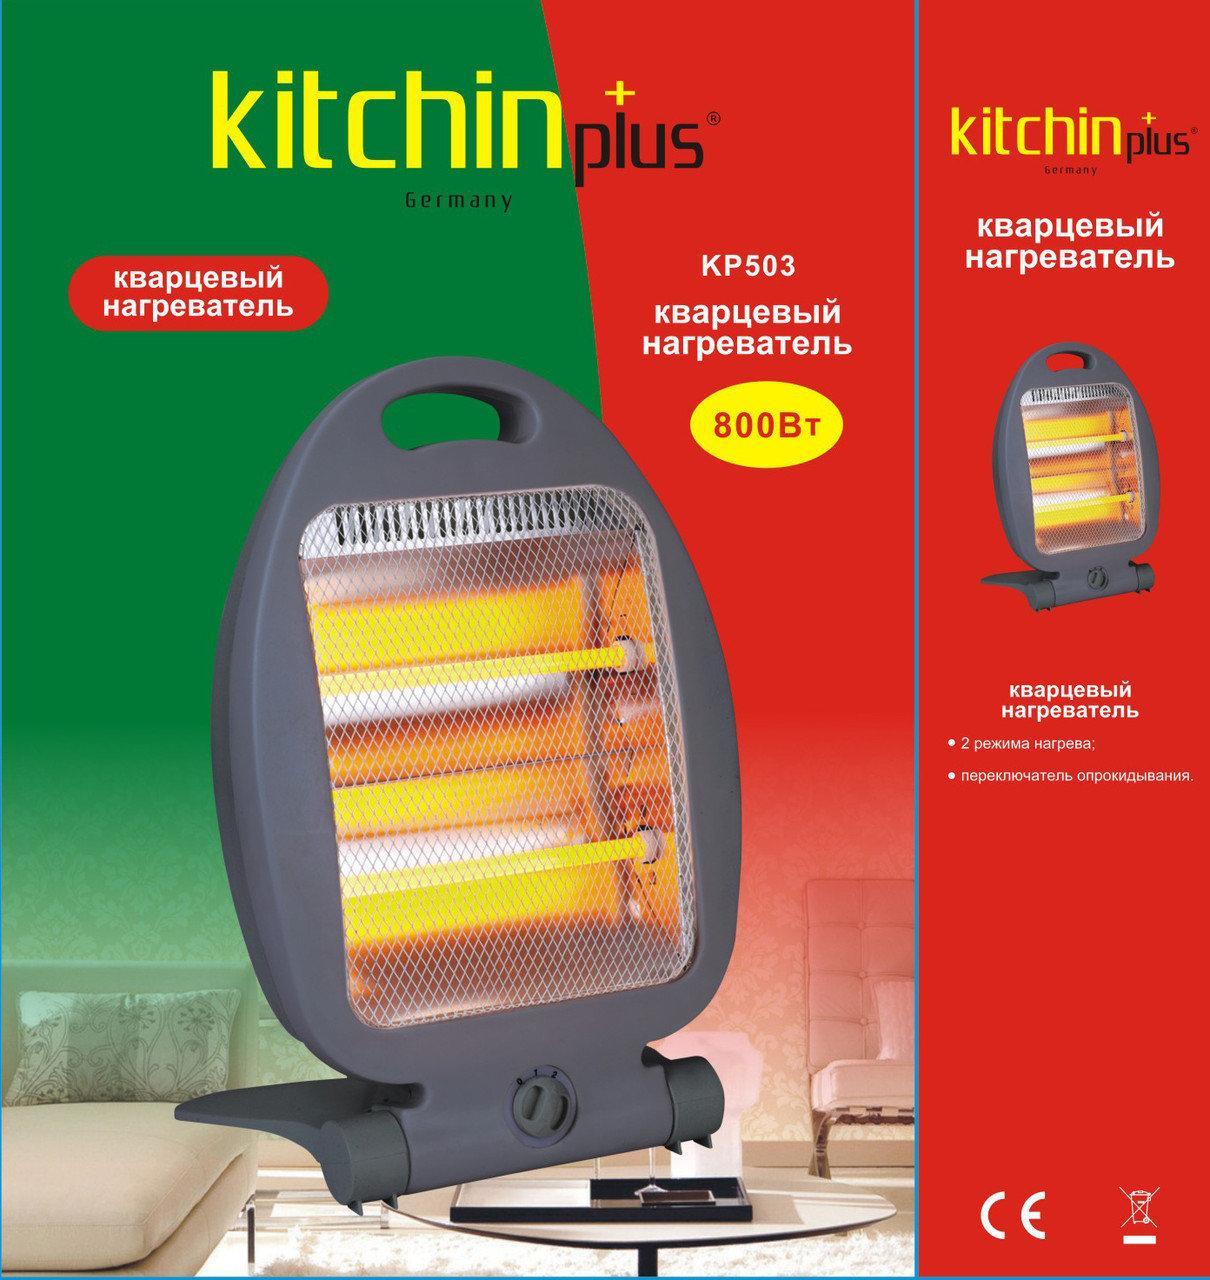 Тепловентилятор Kitchin KP503